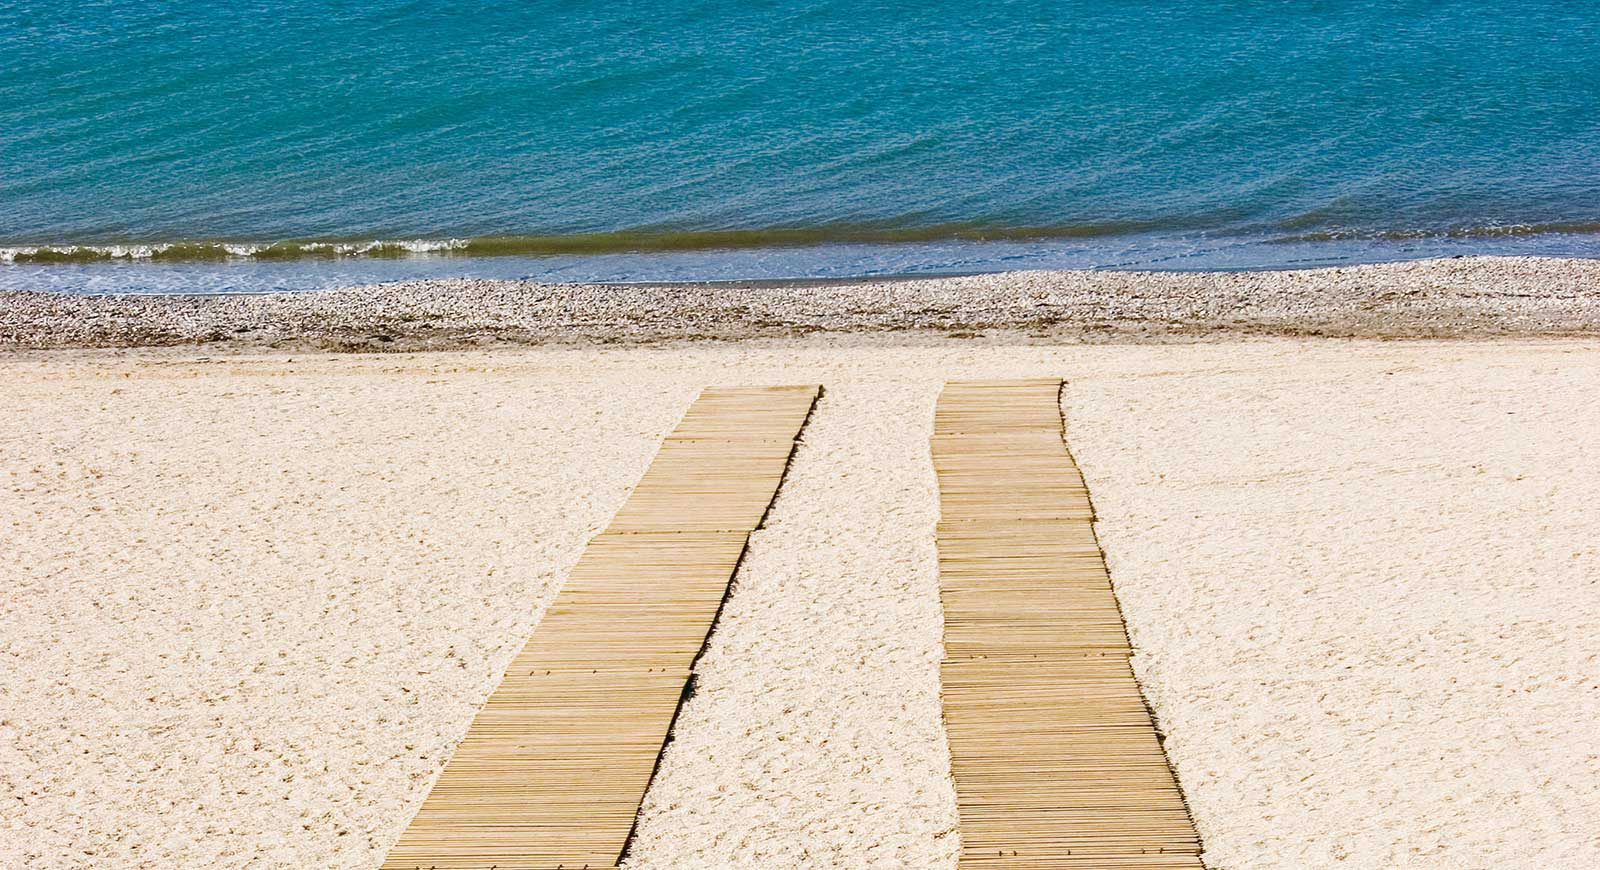 236-beach-2-hotel-barcelo-cabo-de-gata_tcm20-8313_w1600_h870_n.jpg